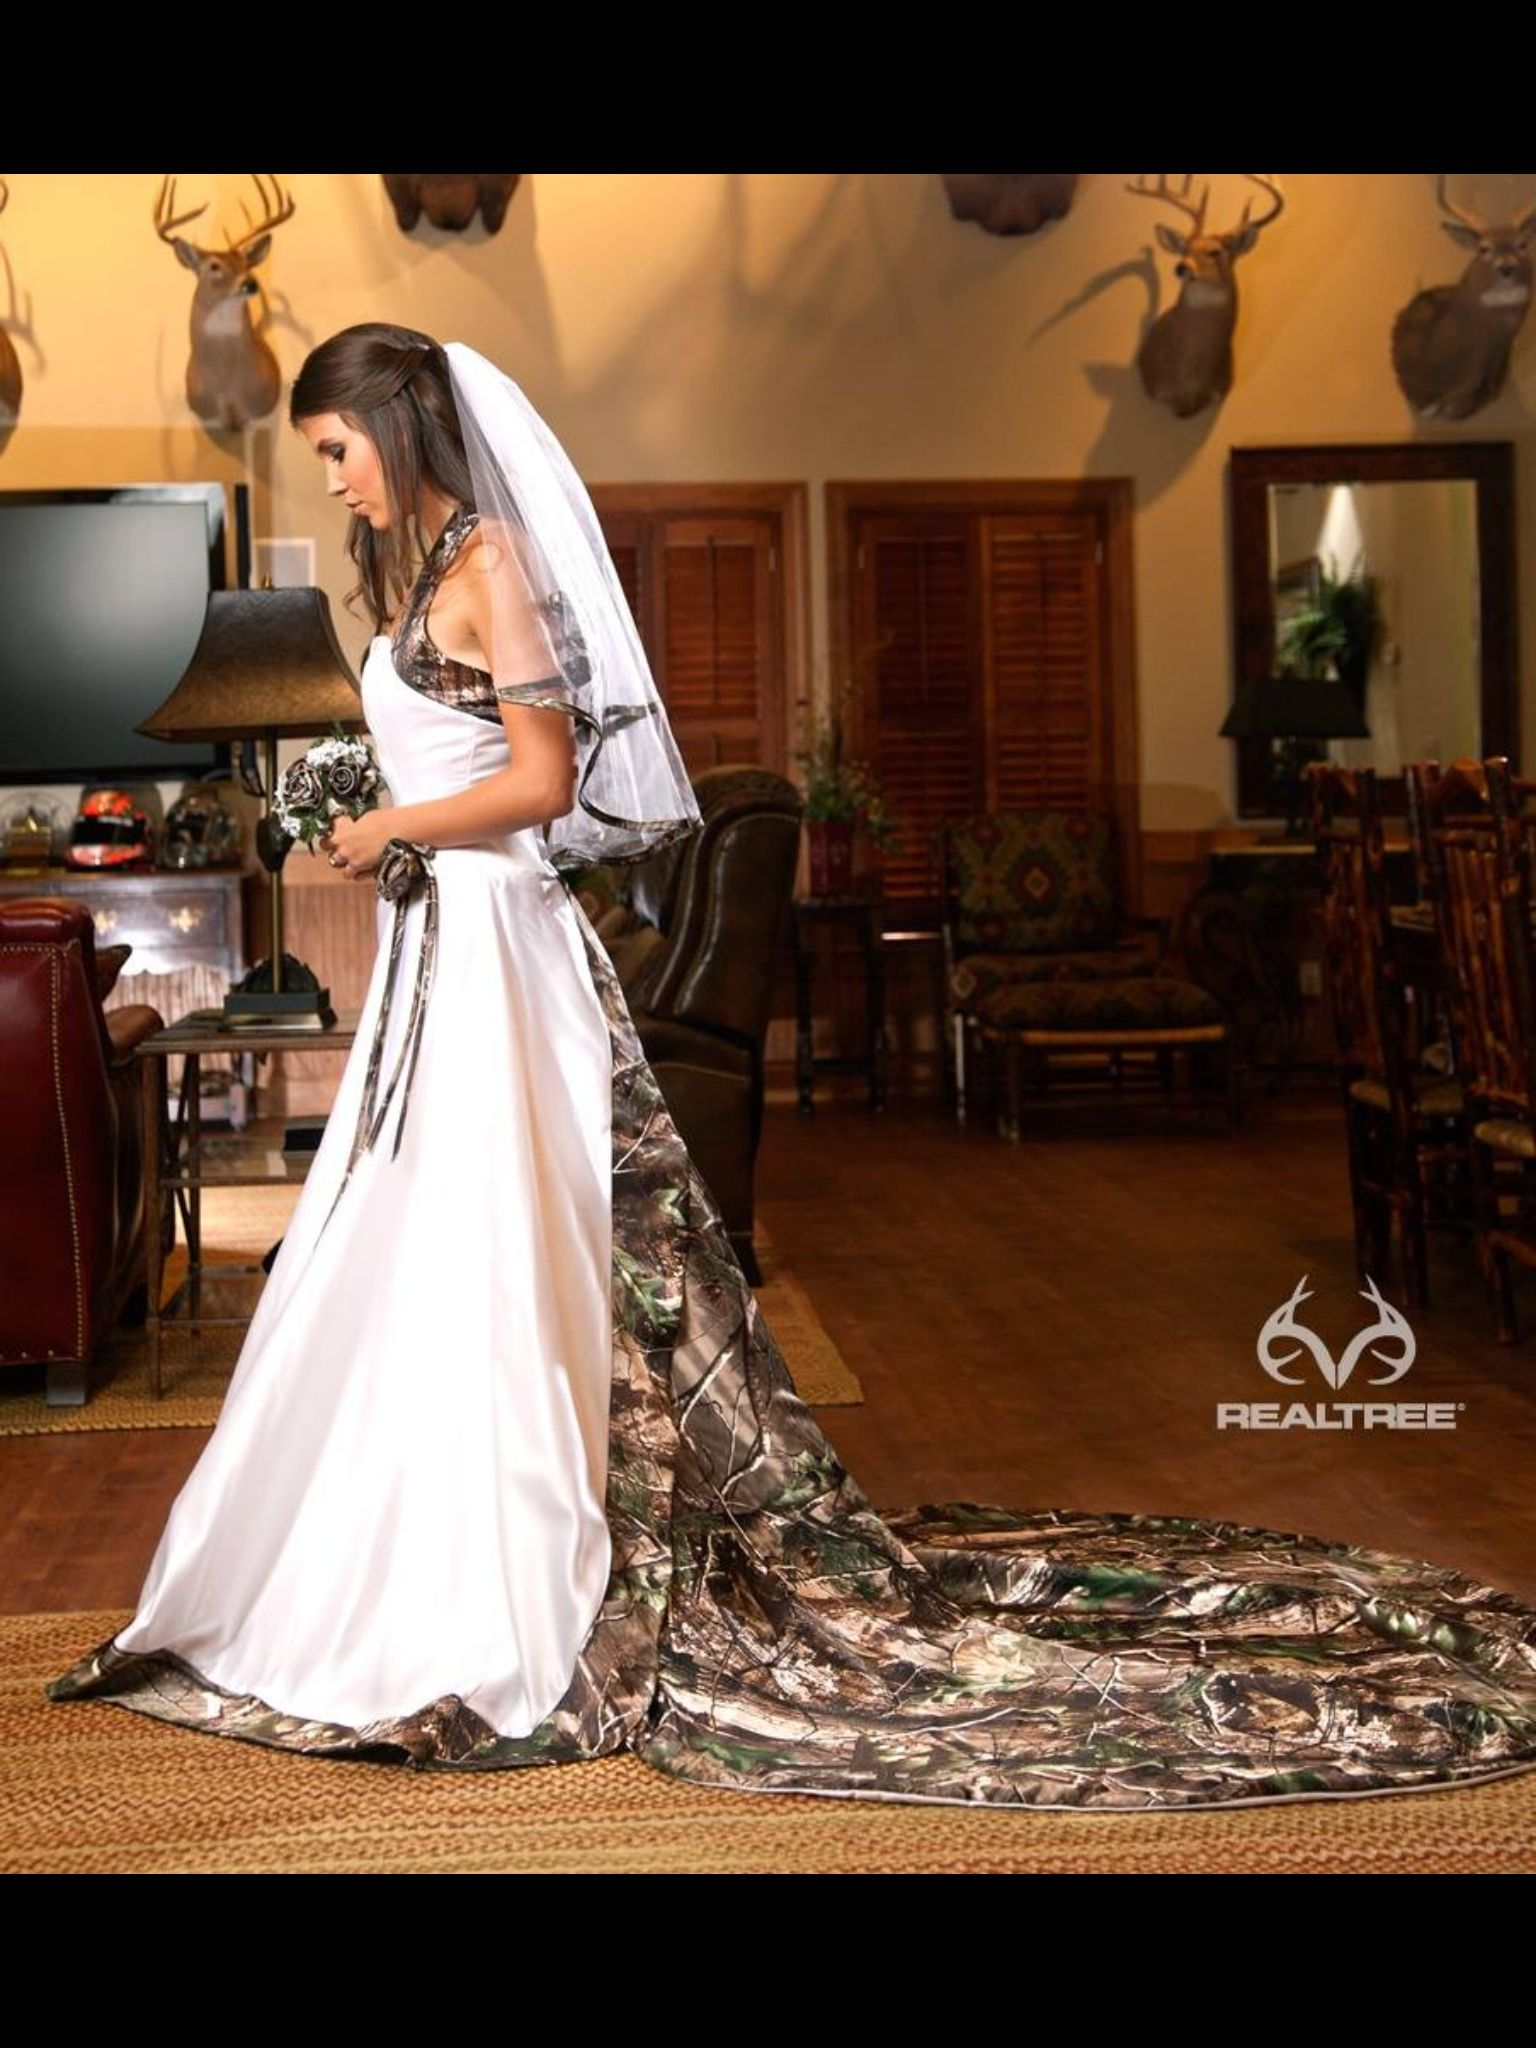 realtree wedding invitations%0A Realtree Camo White Wedding Dress  Camo isn u    t always redneck  My wedding  dress please